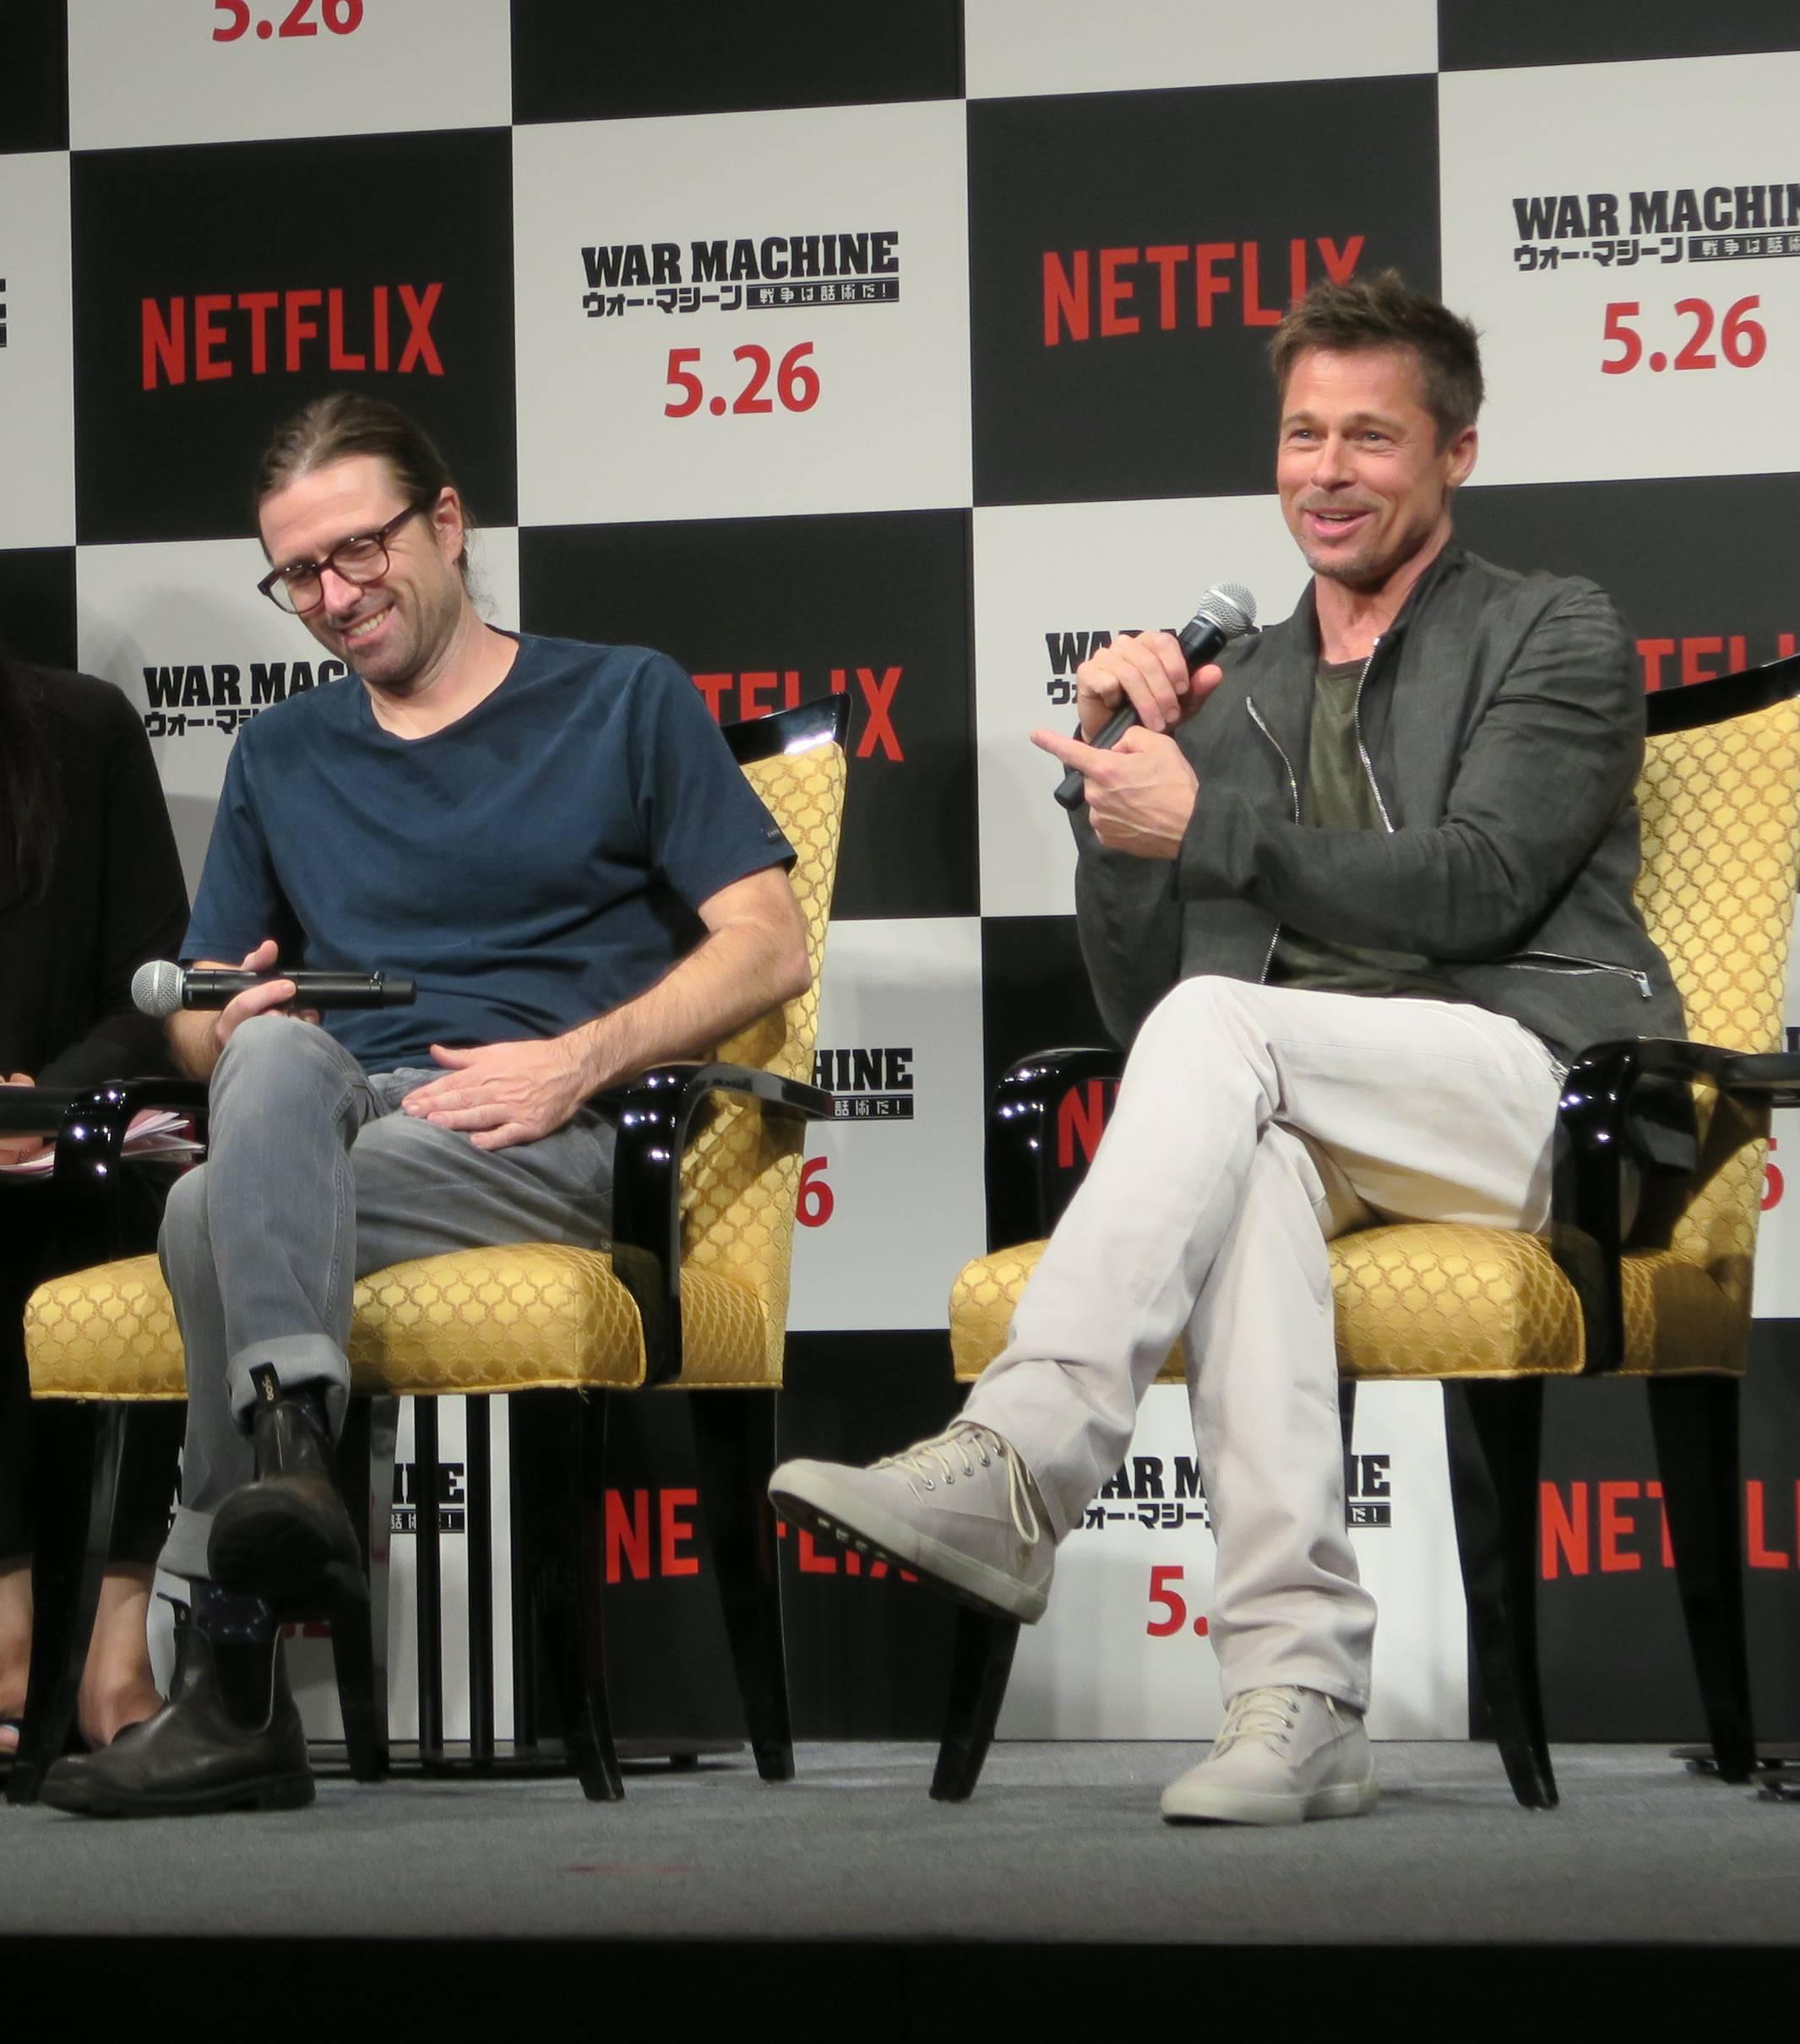 David Michôd (left) and Brad Pitt (right) shares a joke at the Japan press conference for the Netflix original film 'War Machine'.